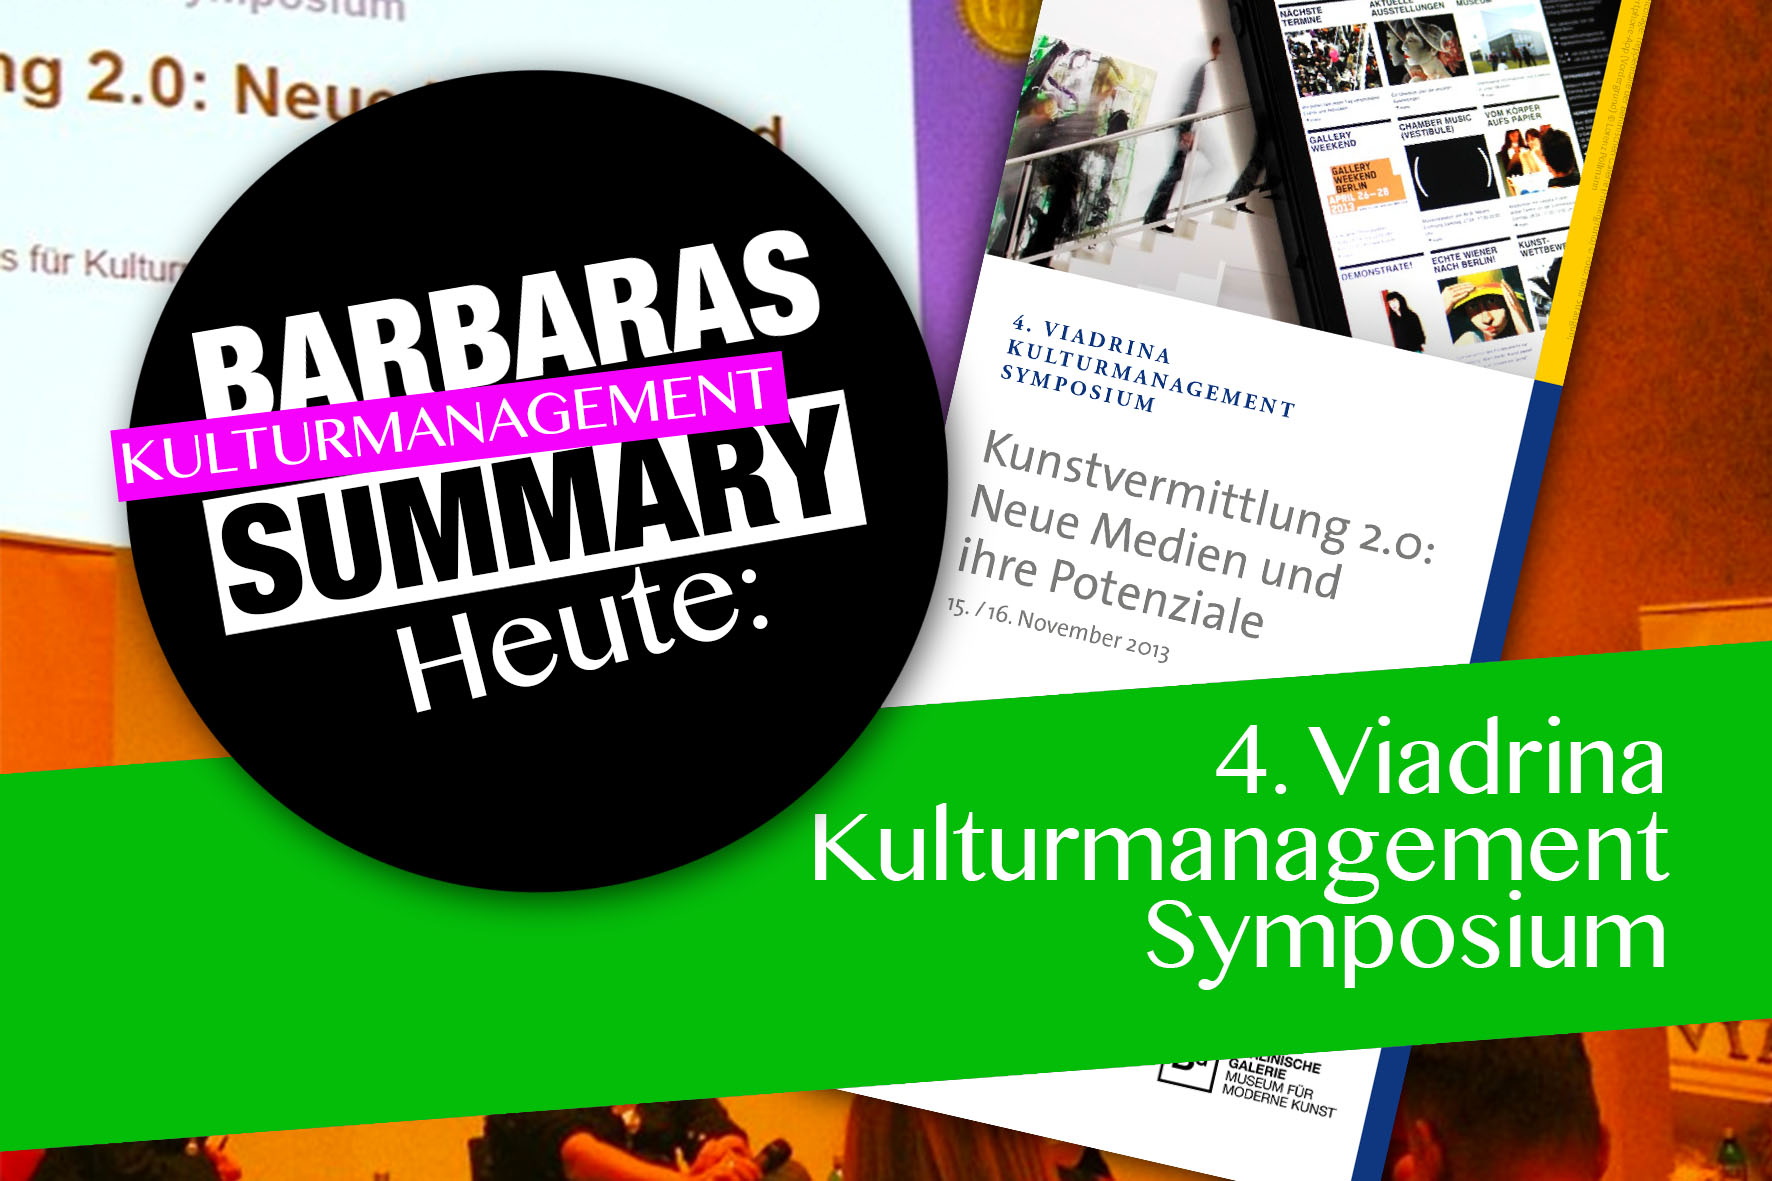 Kunstvermittlung 2.0: Summary vom 4. Viadrina Kultur Symposium